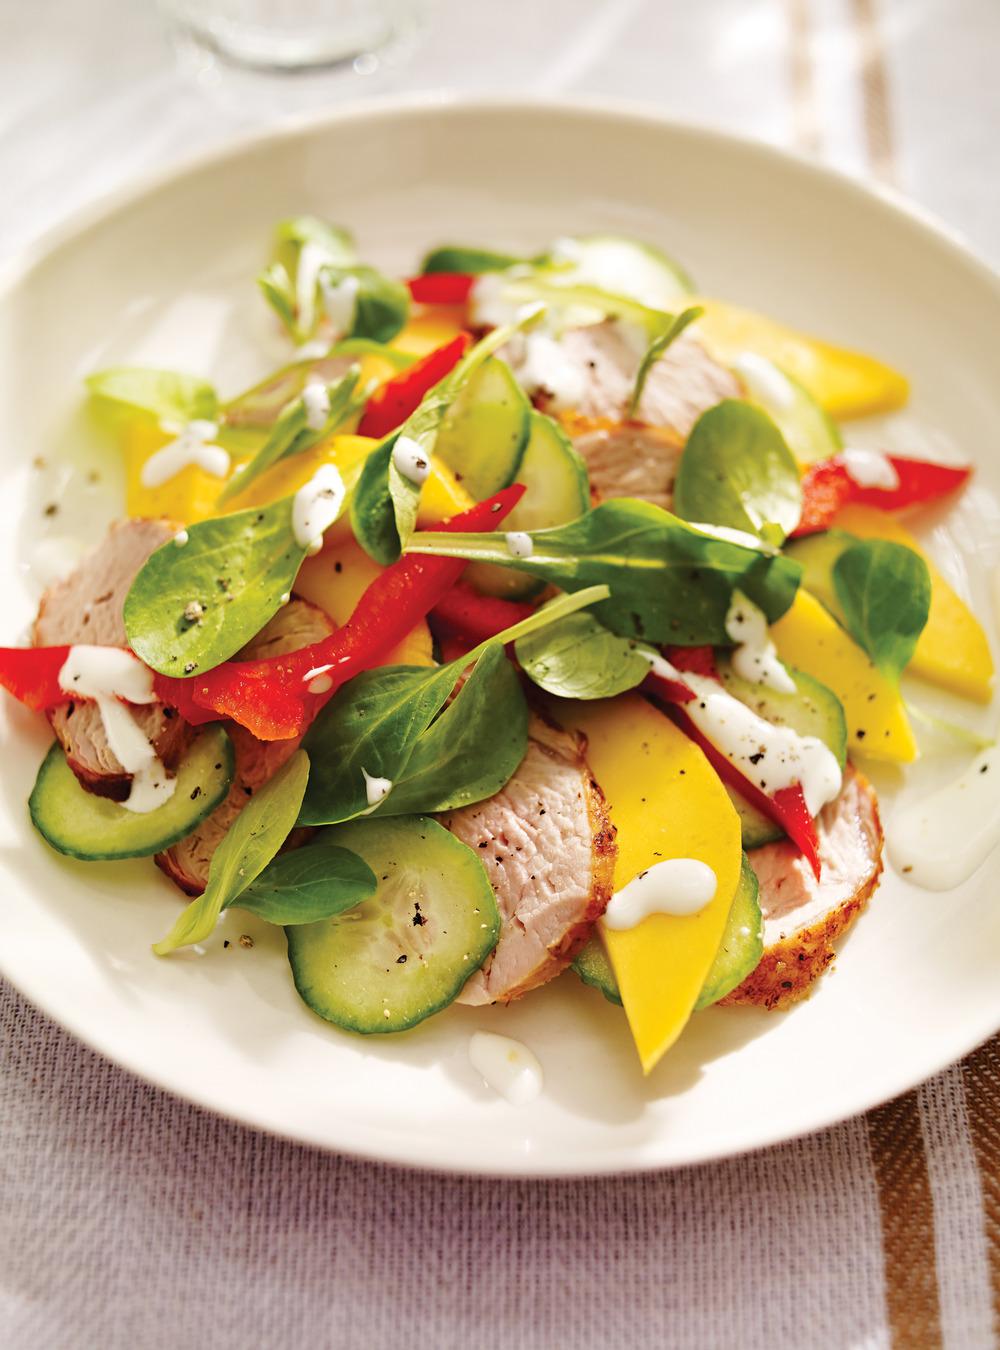 Salade de filet de porc à la mangue et au poivron   ricardo